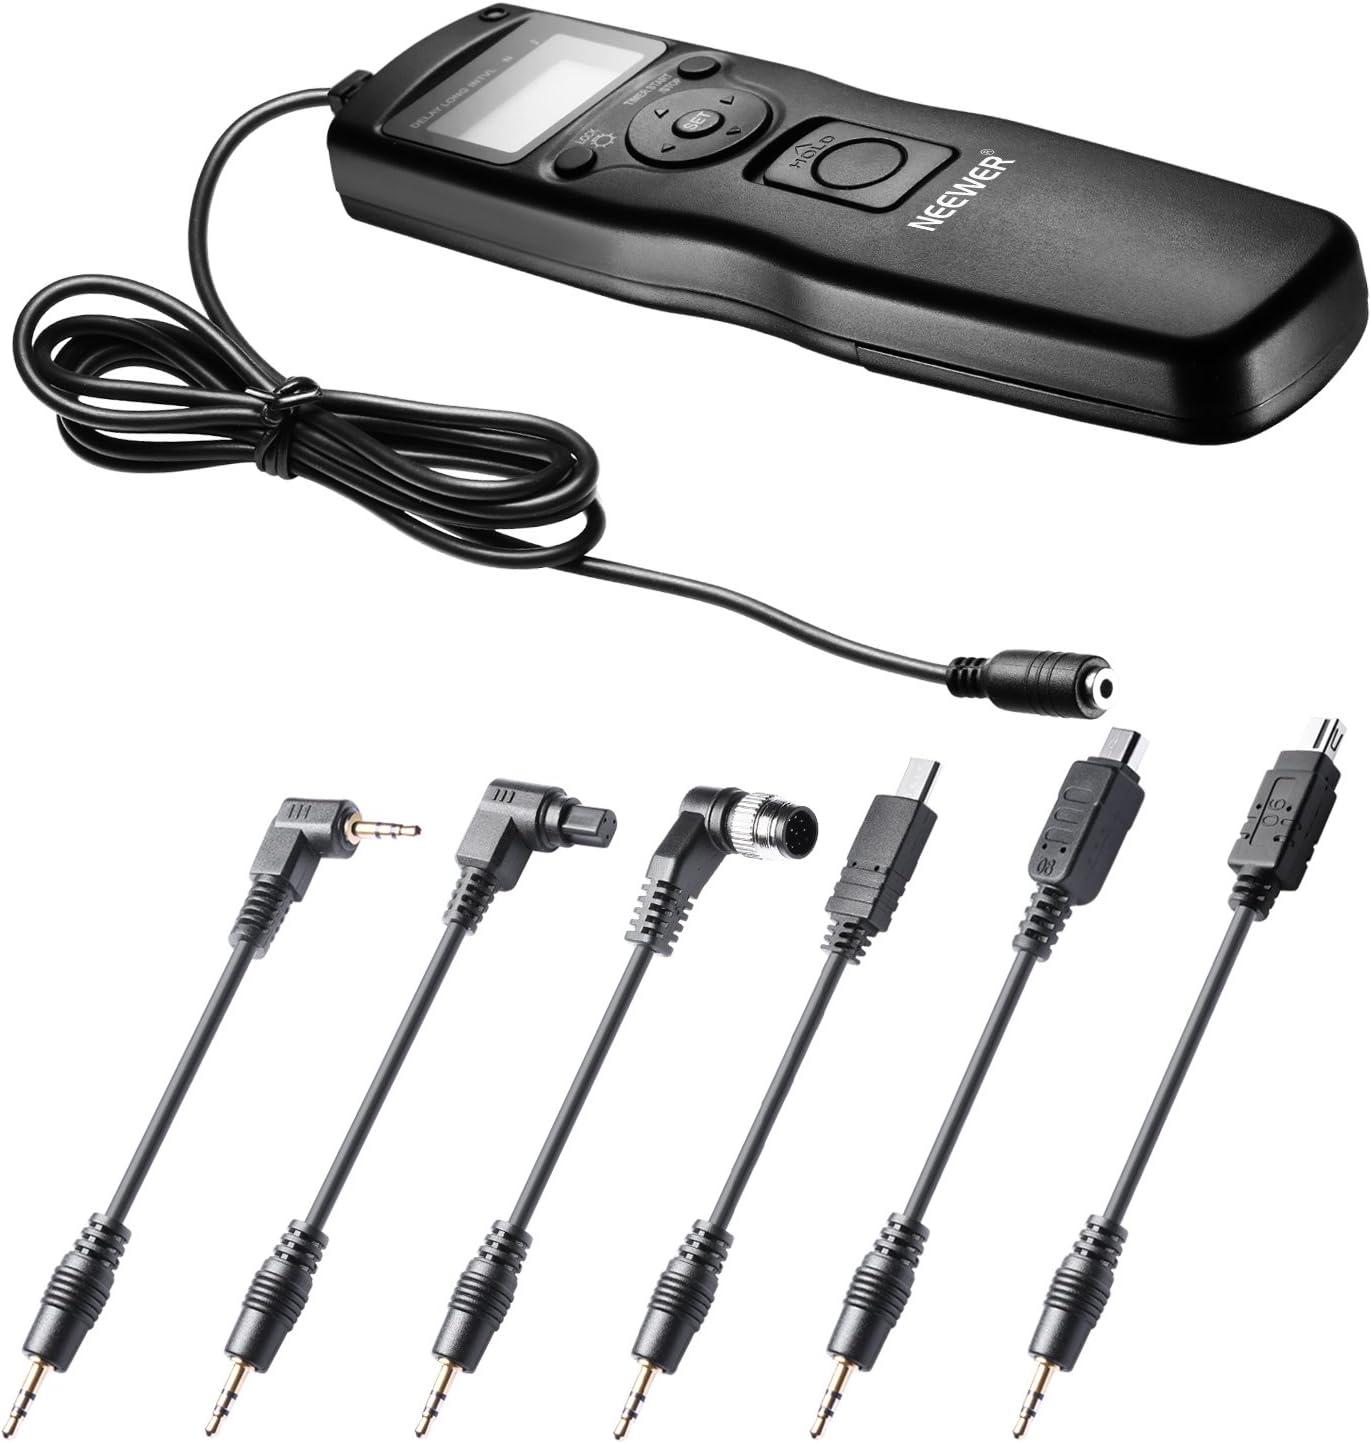 Disparador temporizador 6 en 1 para Canon, de Neewer®, para modelos 700D, 650D, 550D, 60D, 5D MarkIII, 6D, 70D, 7D MarkII, Nikon D4, D300s, D700, D800, D90, D7100, D600, D5300, D610, D5100, D3200, D31